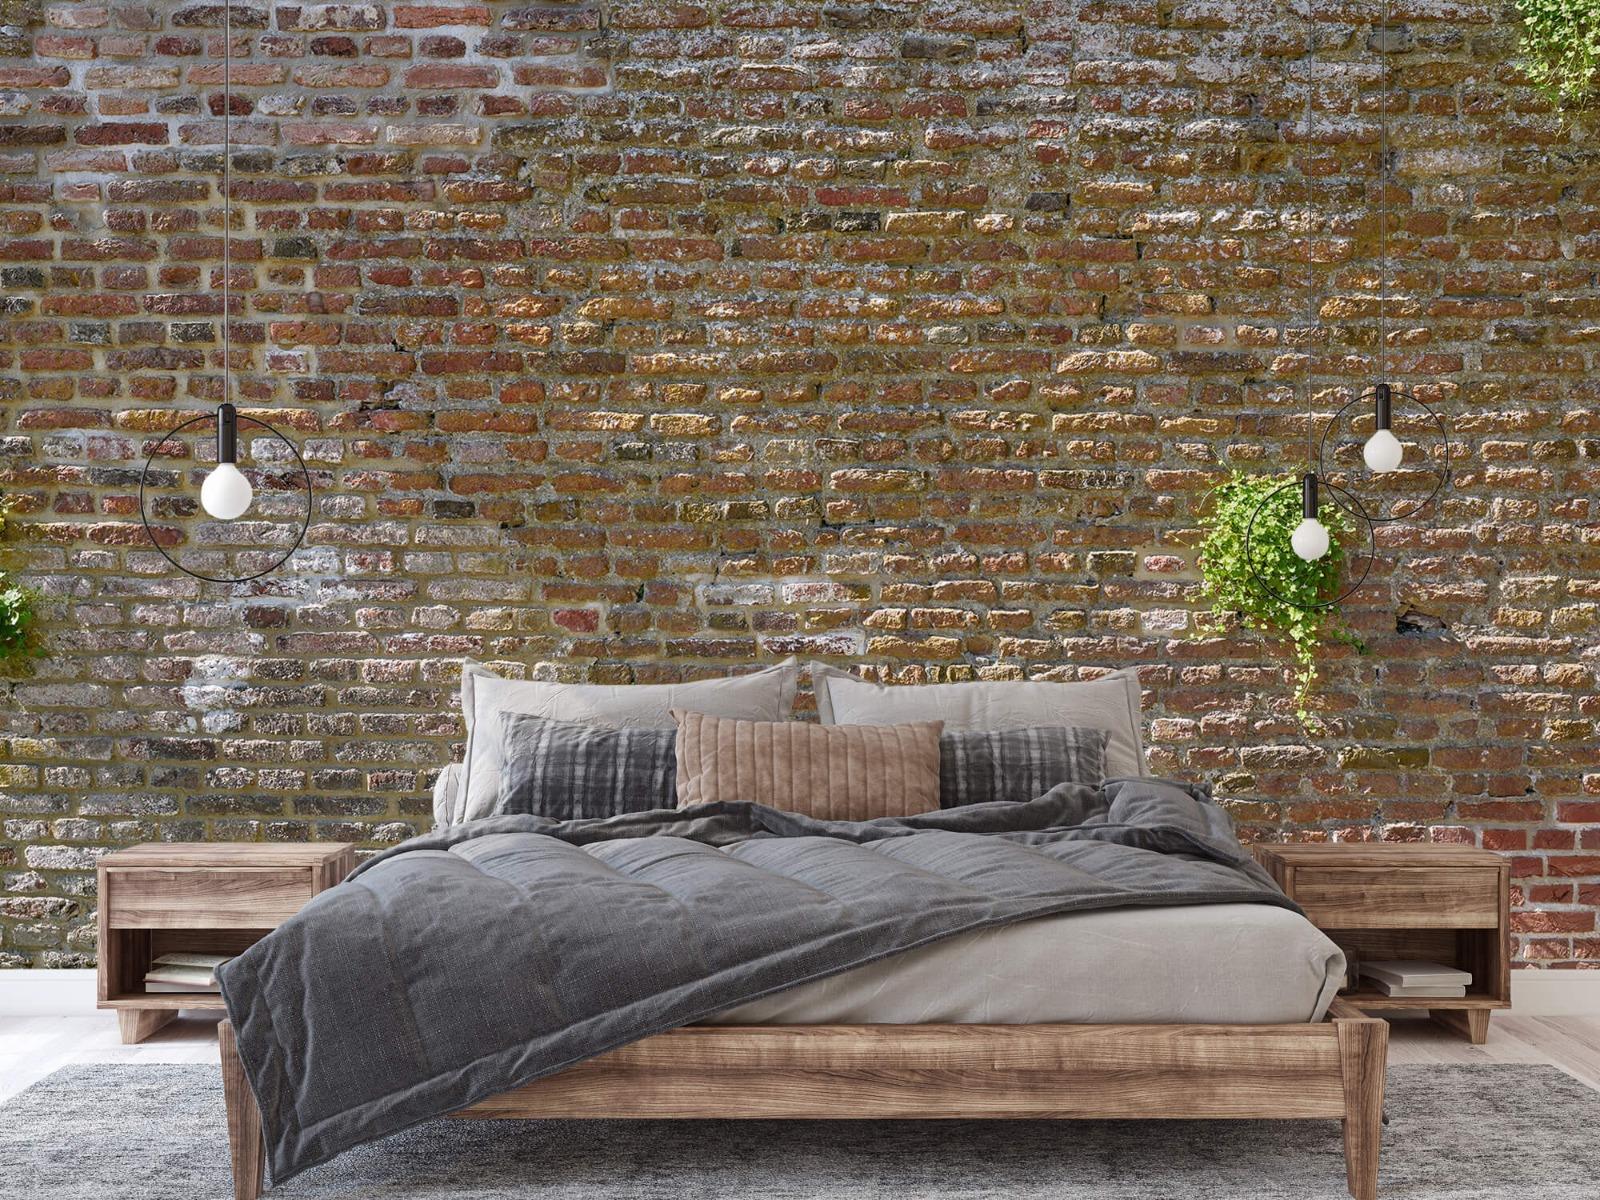 Stenen - Oude stenen stadsmuur met plantjes 3